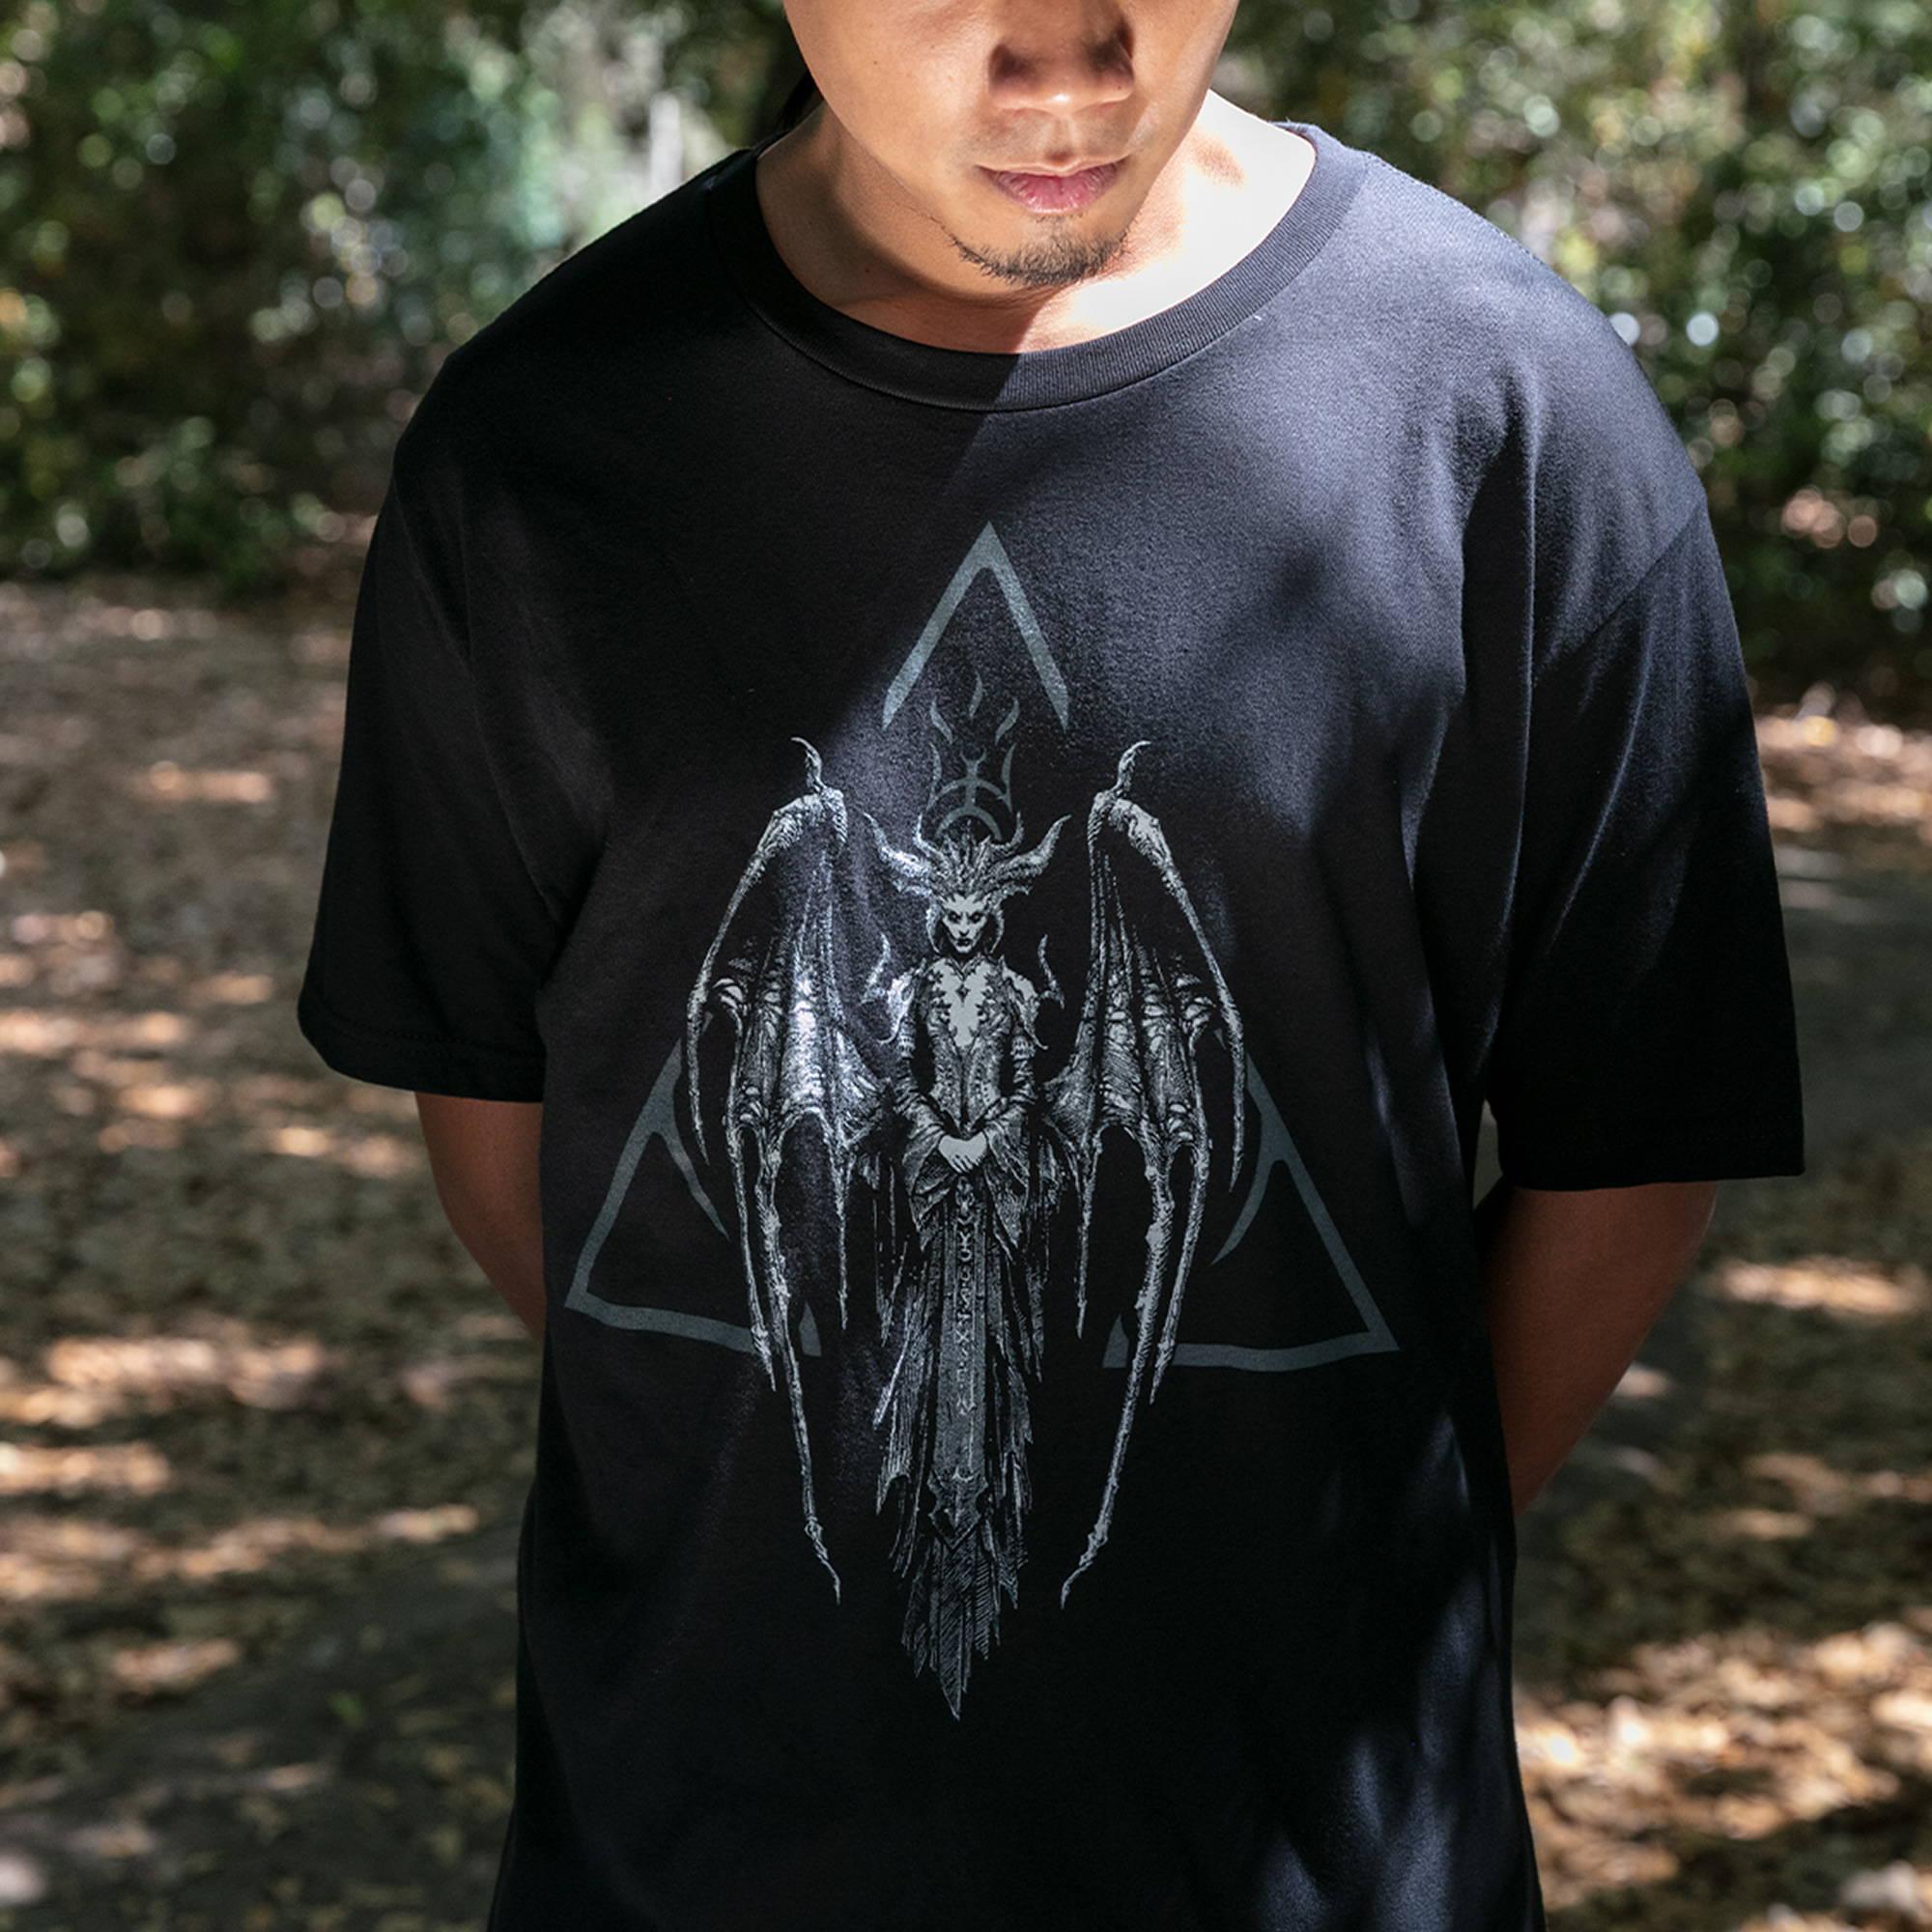 Male model wearing a Diablo hat and shirt